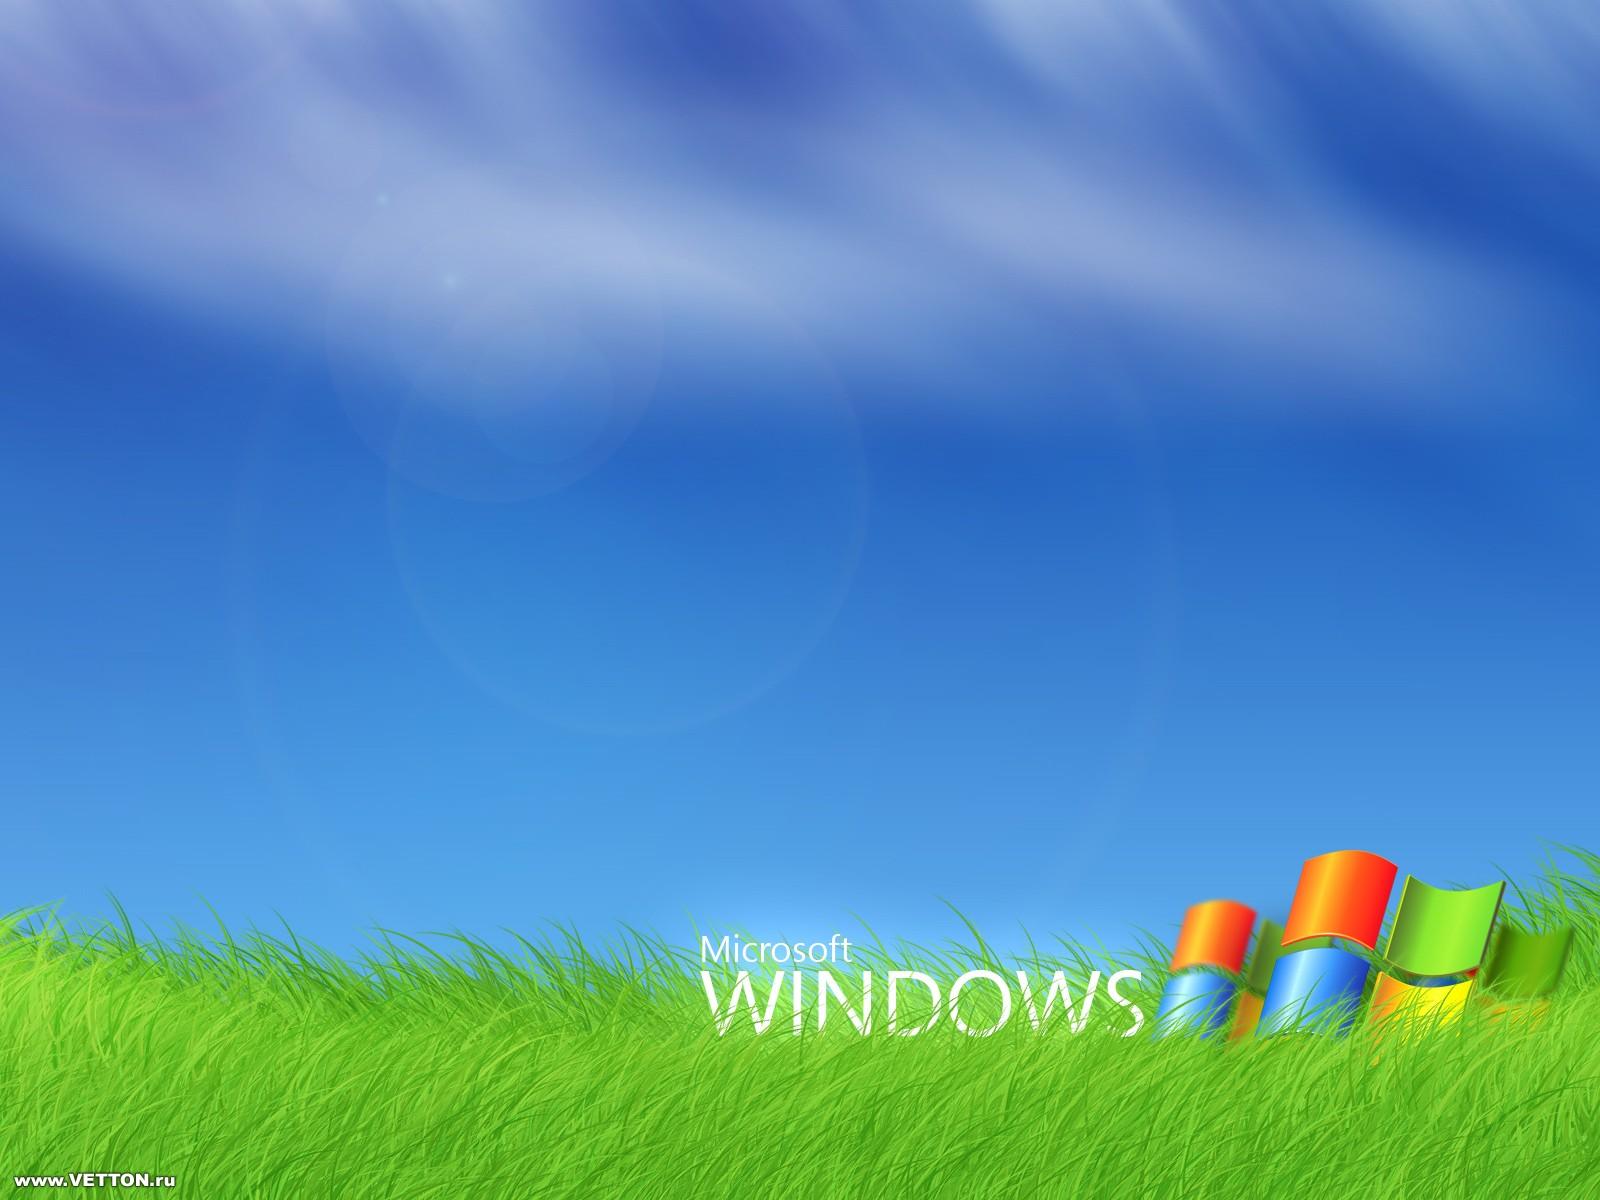 http://4.bp.blogspot.com/-R8X6fJ43WV8/TxJGoeV7OTI/AAAAAAAACs0/PewZ9hnzVJQ/s1600/Best+Wallpaper+in+Win+XP.jpg